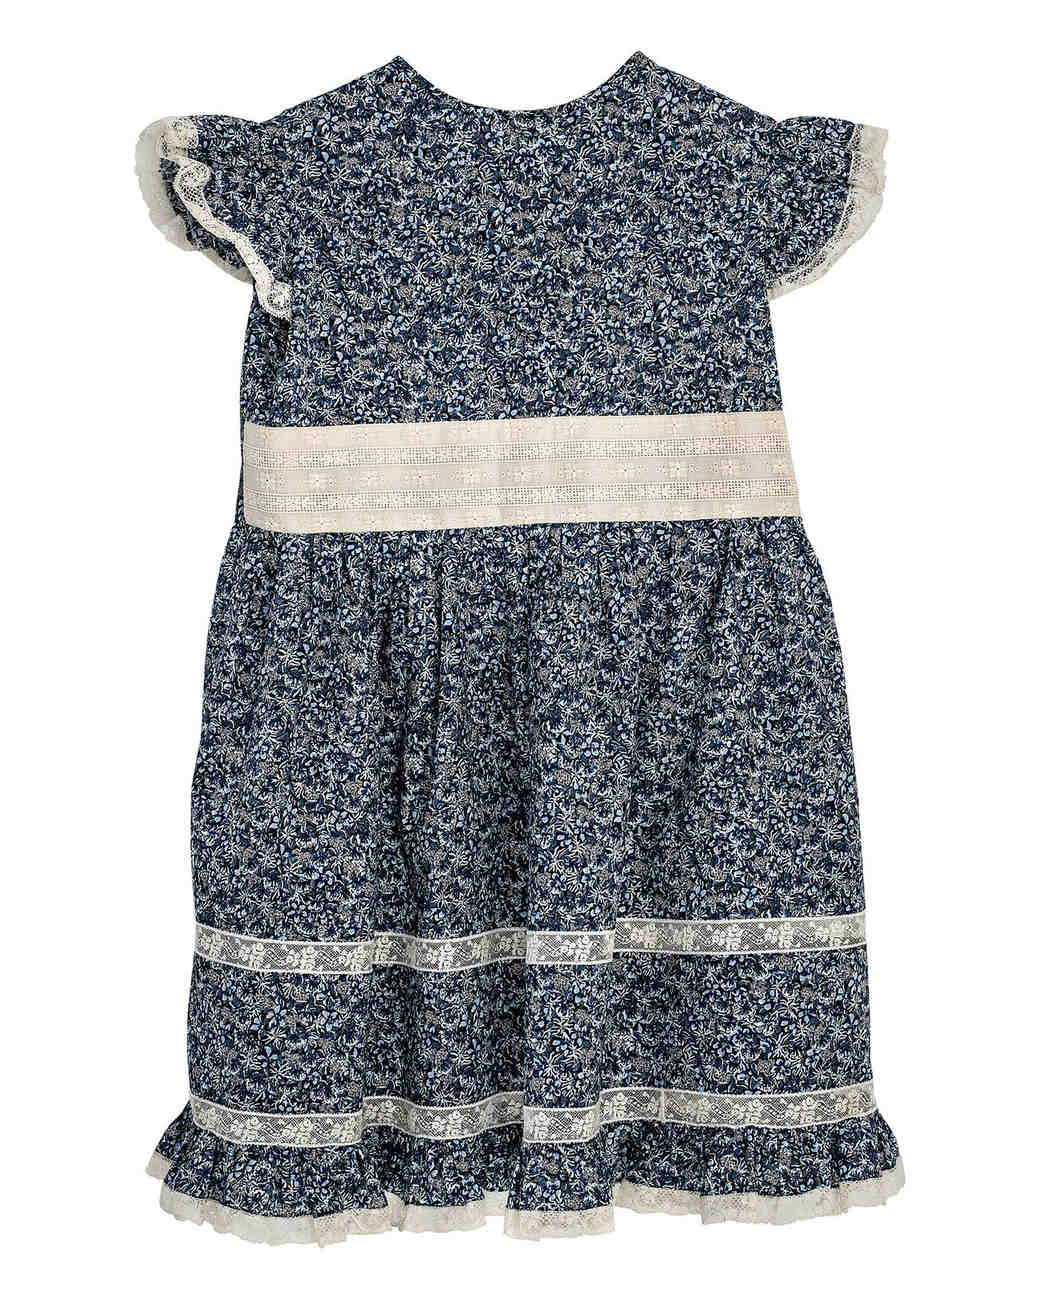 dark blue floral flower girl dress